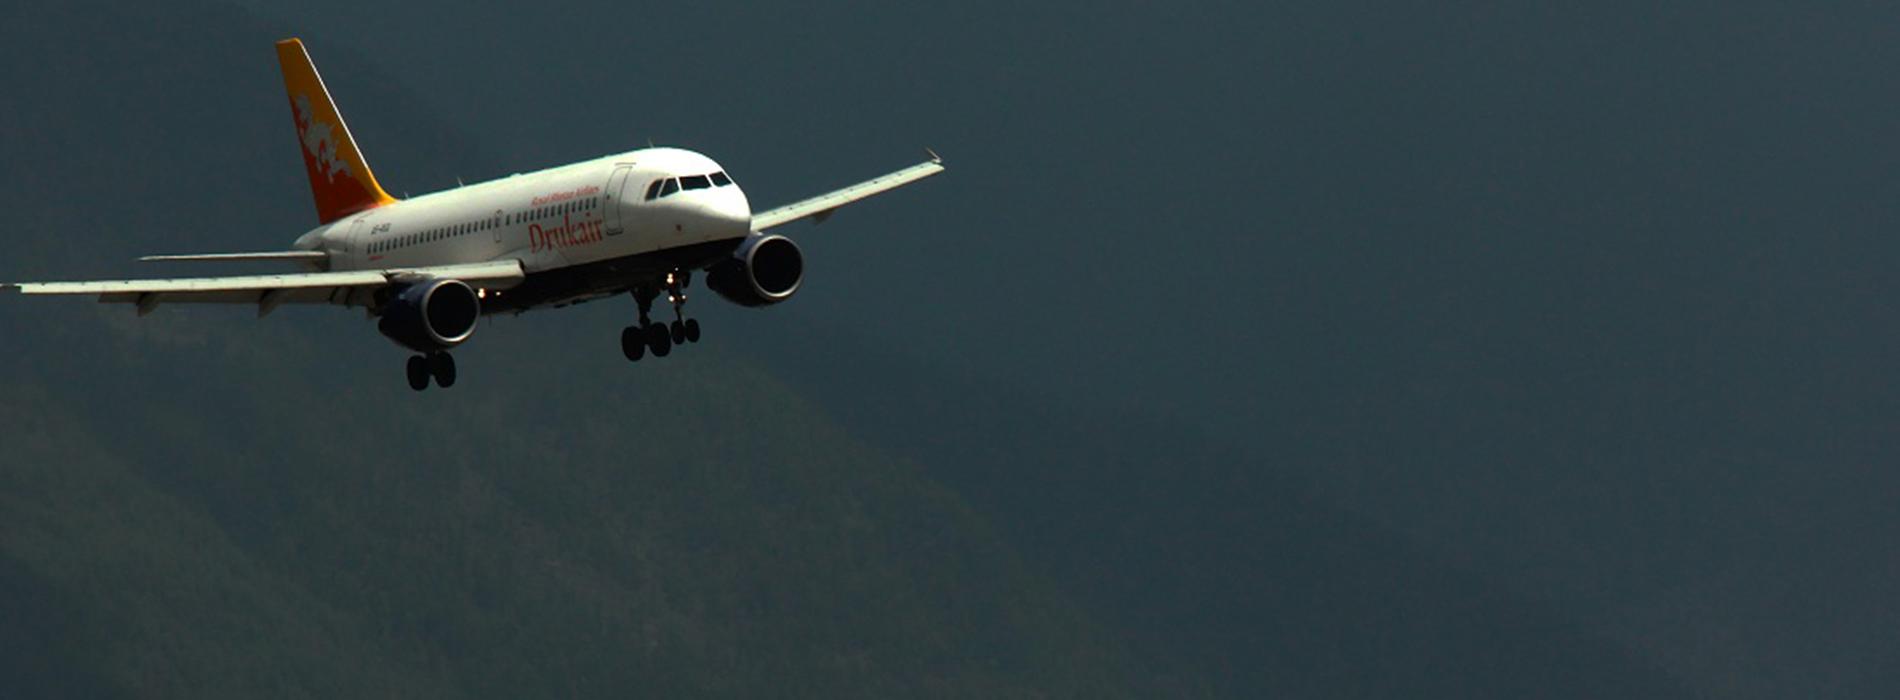 Drukair Royal Bhutan Airlines Diagram Of A Jet Engine Image Credit Wikipedia Previous Next